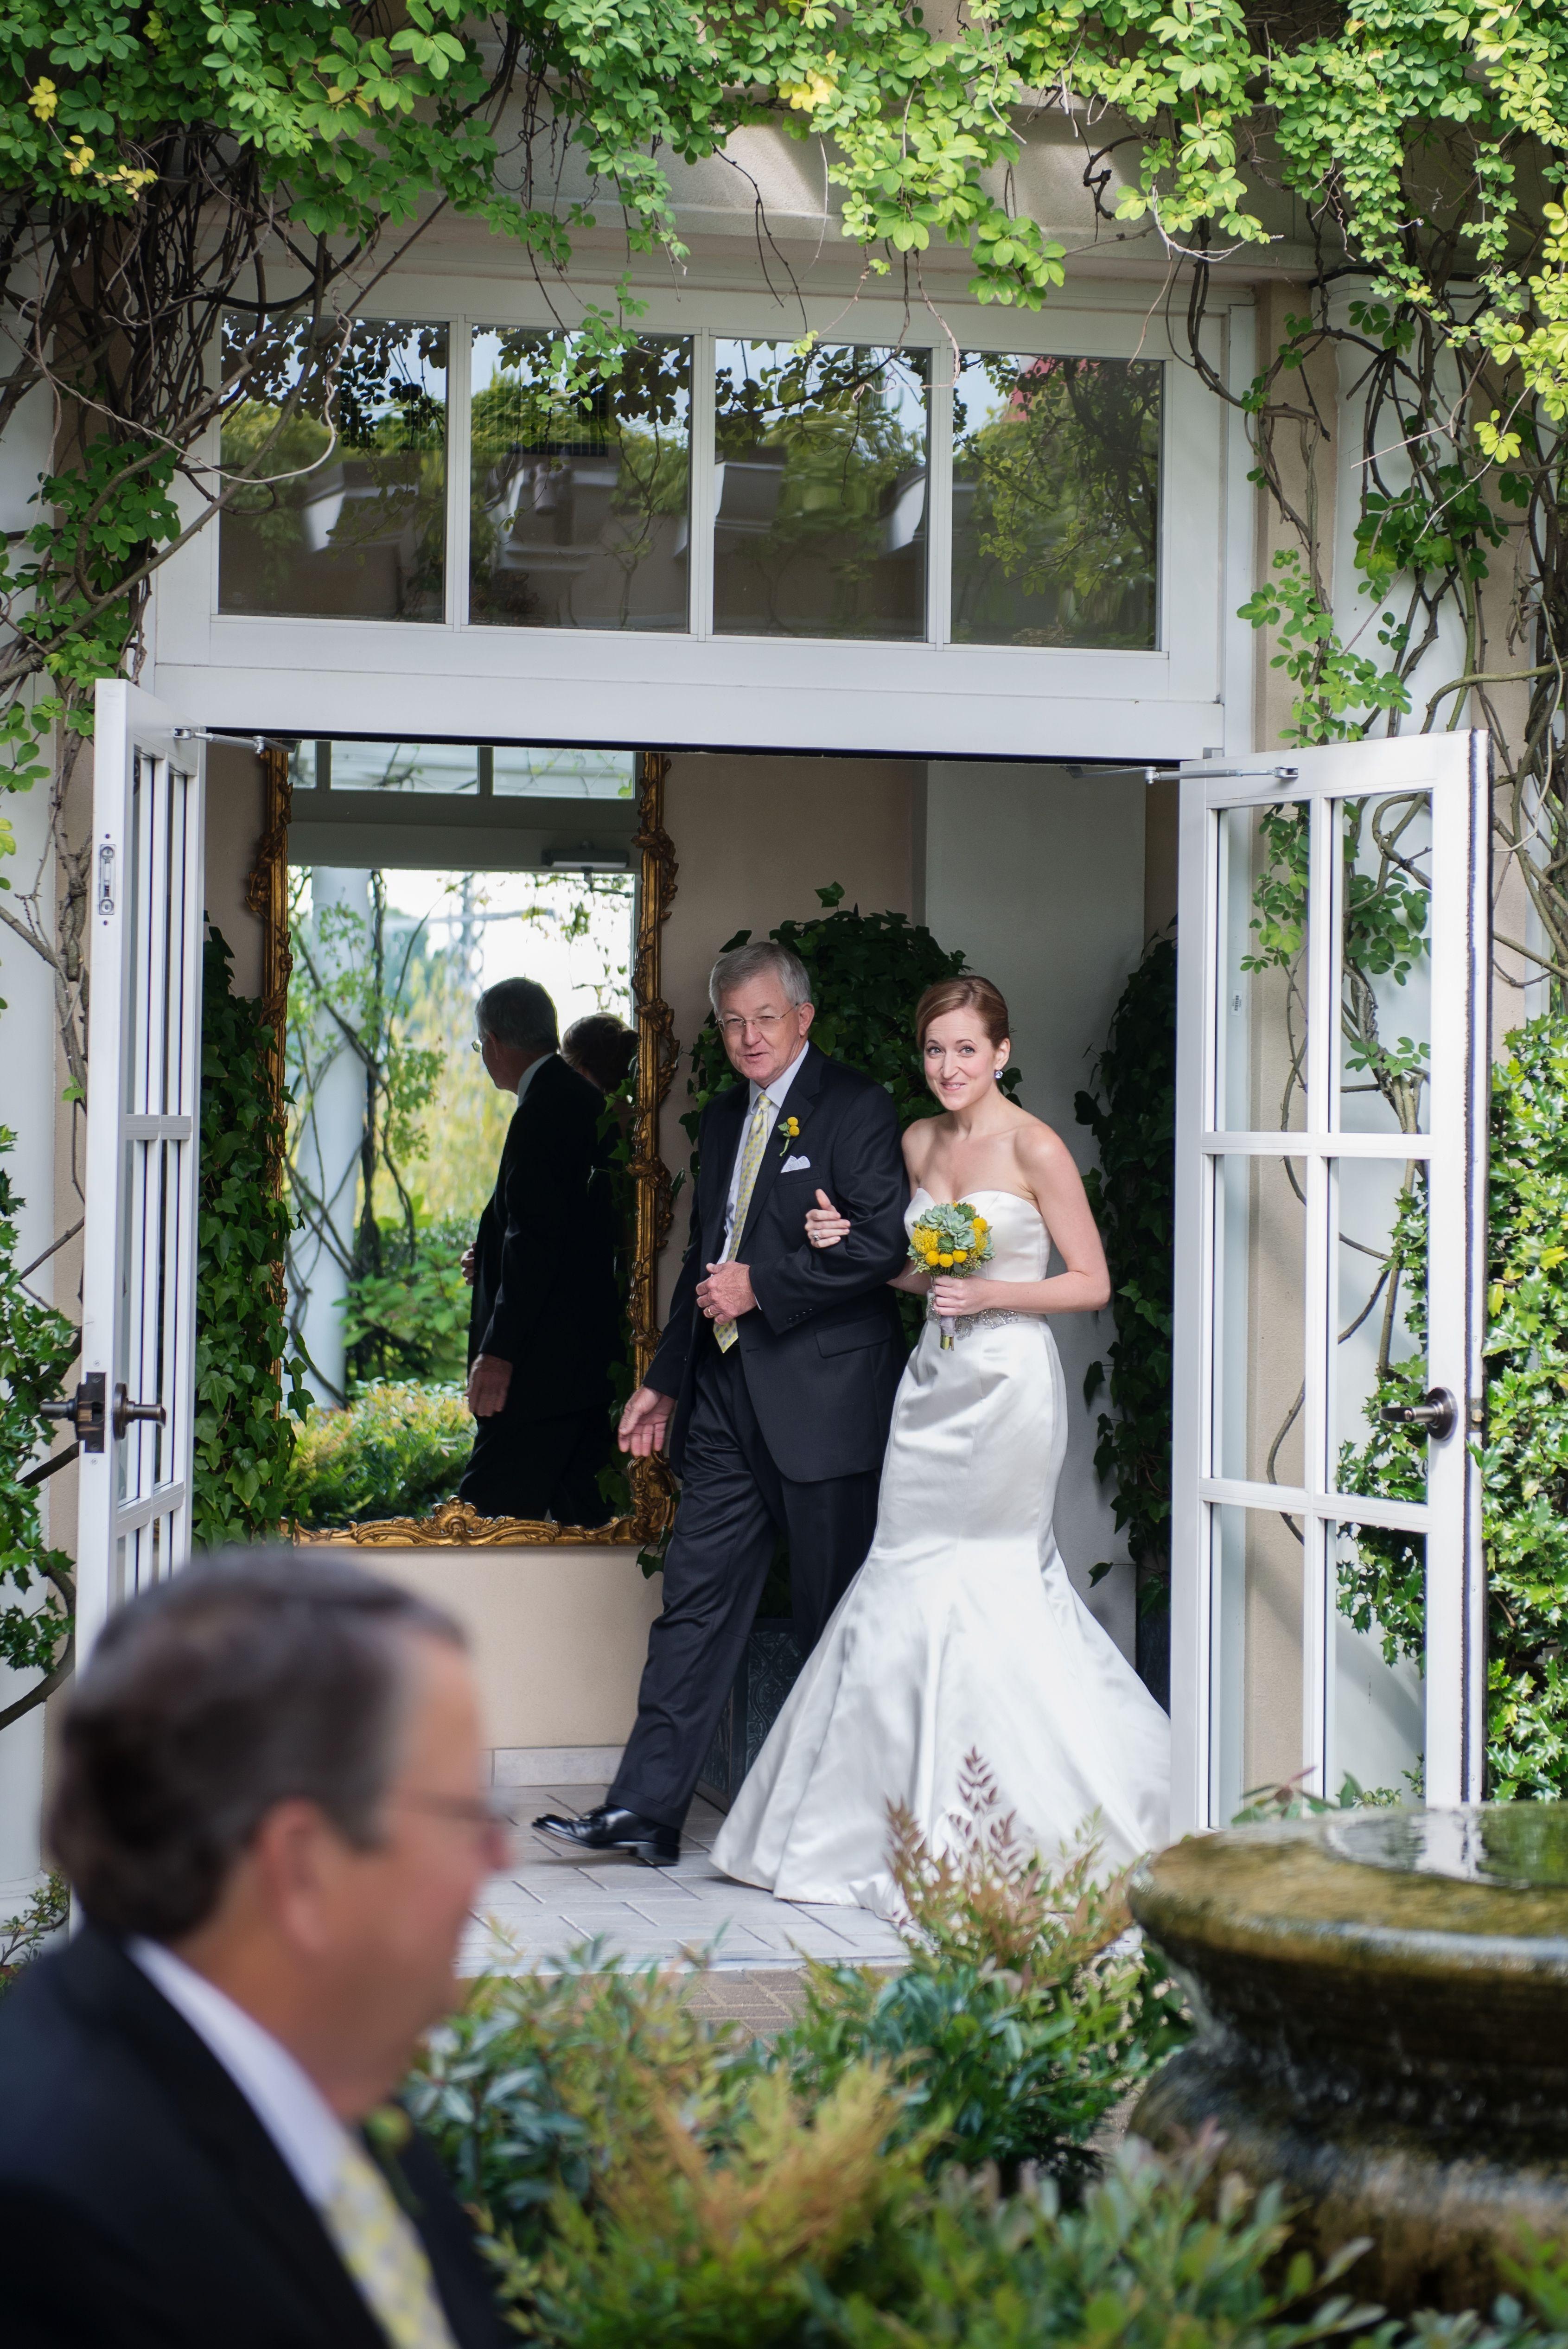 O Henry Hotel Weddings Pavilion And Cloister Garden Greensboro Nc Jenn Lewis Photography